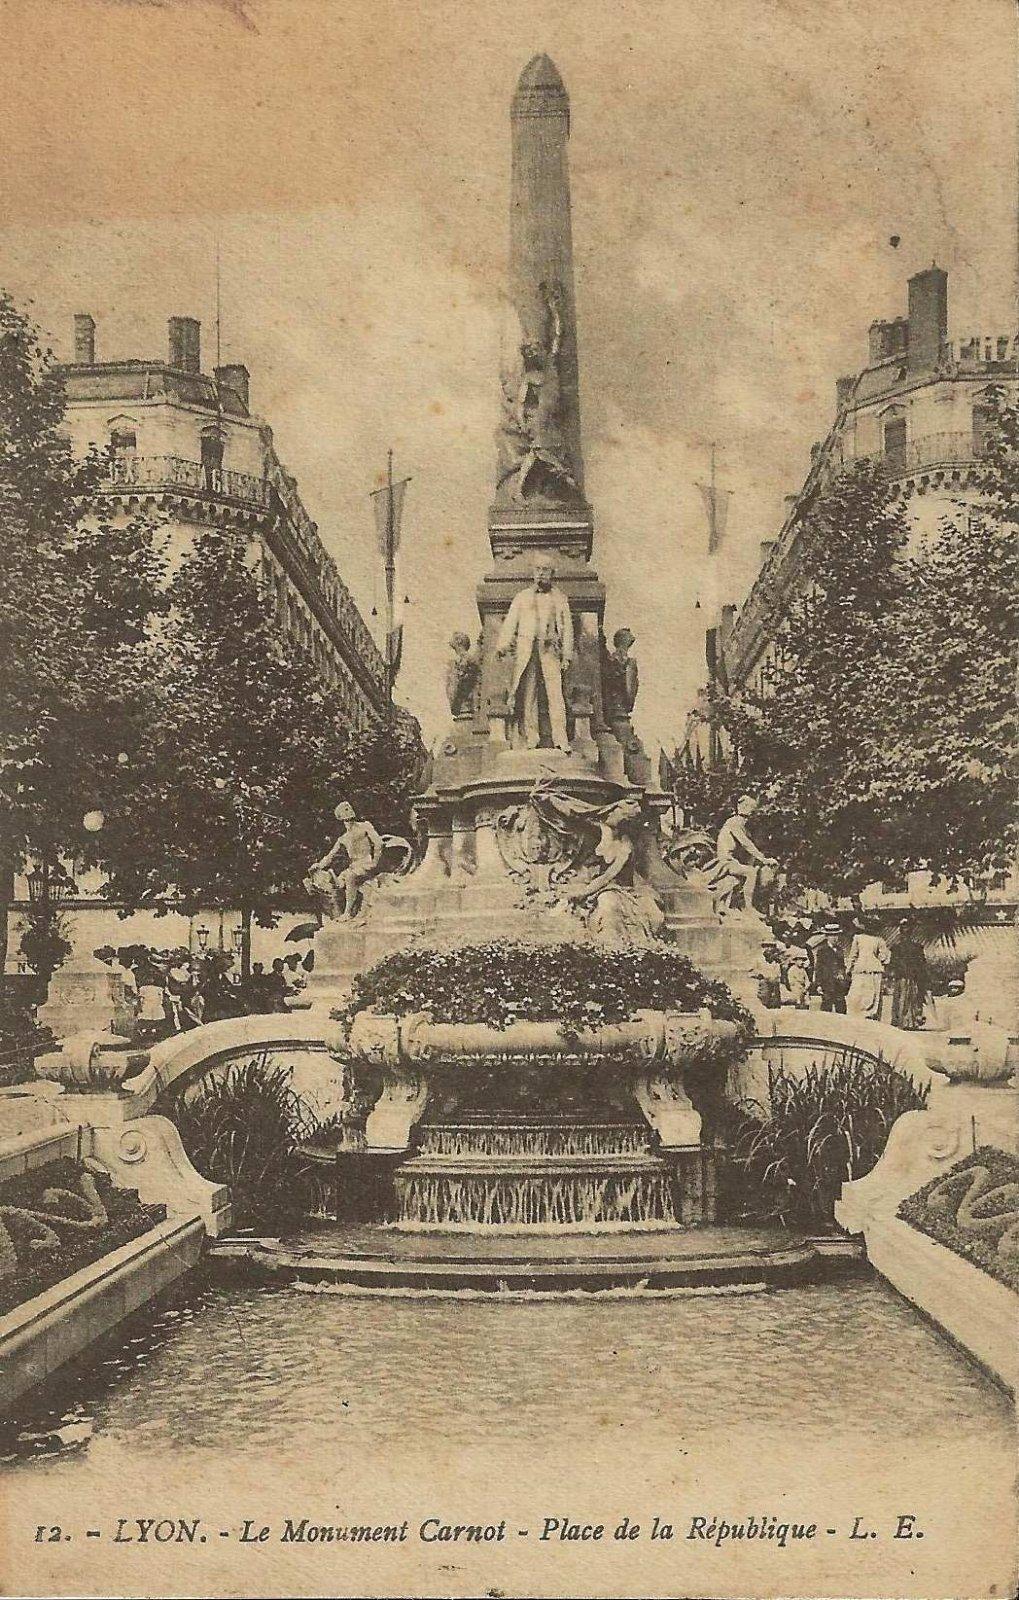 lyon monument carnot 1912